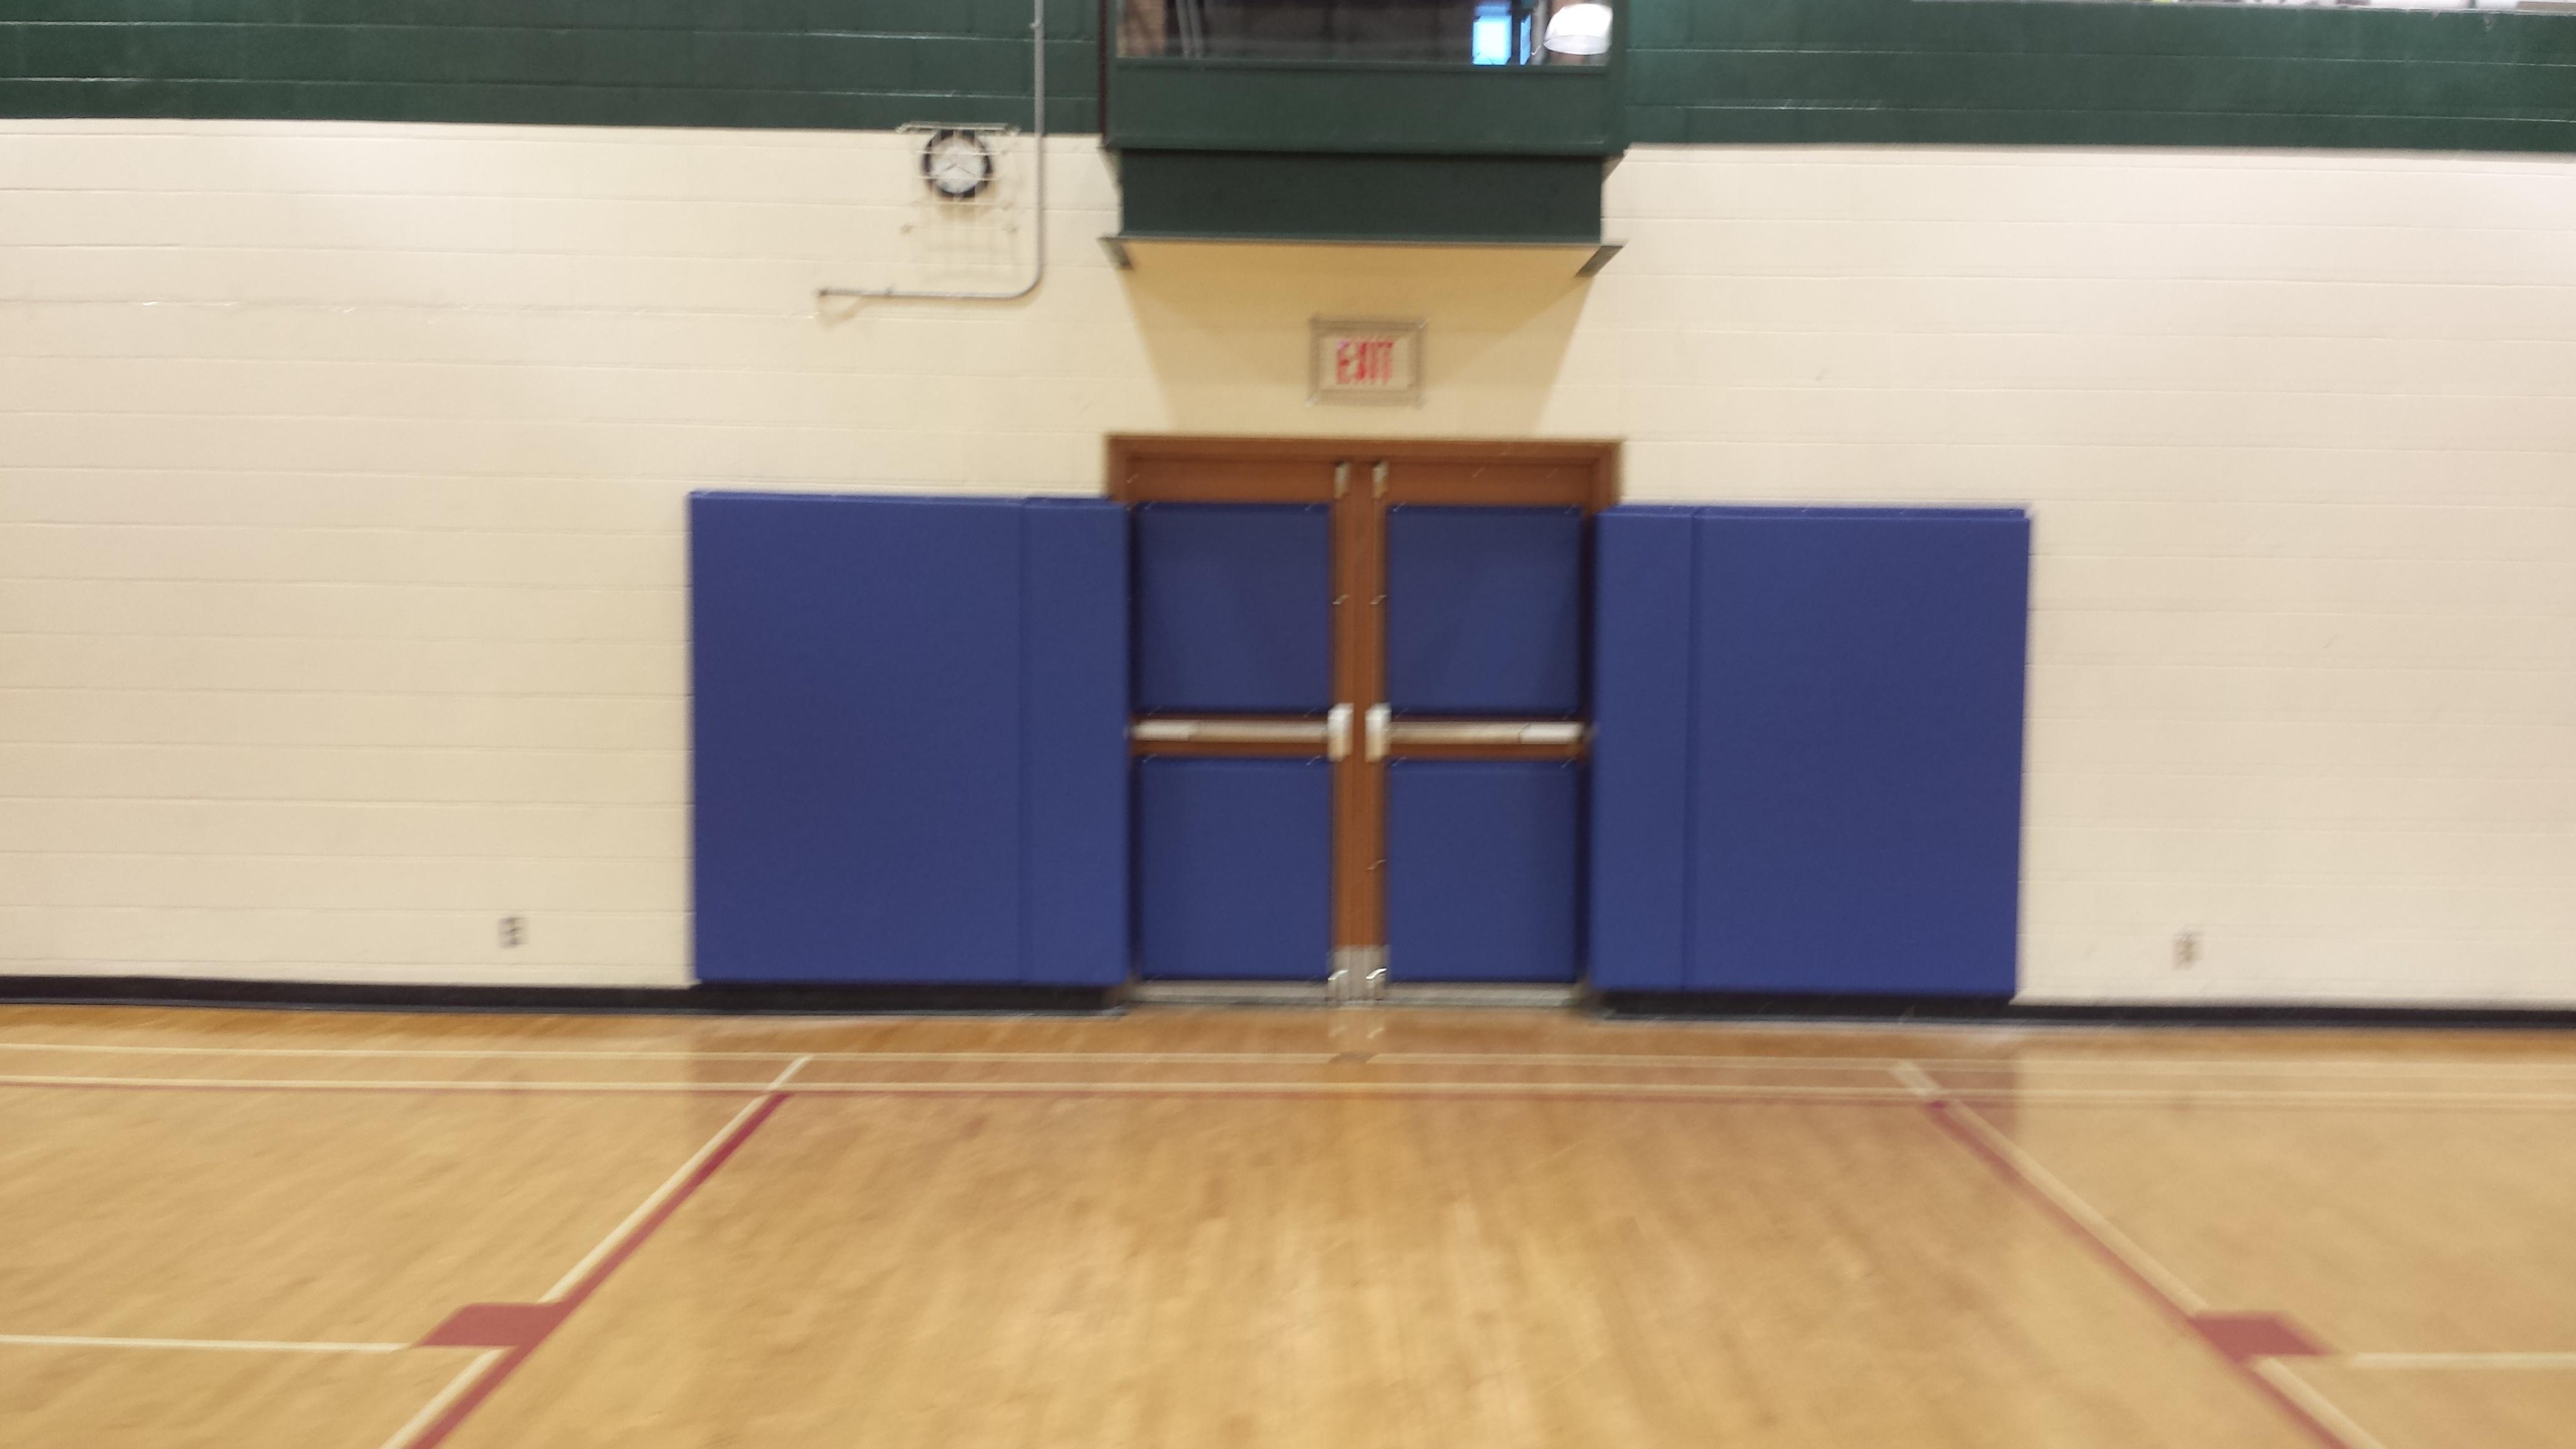 Dufferin_Clarke-custom-wall-and-door-padding